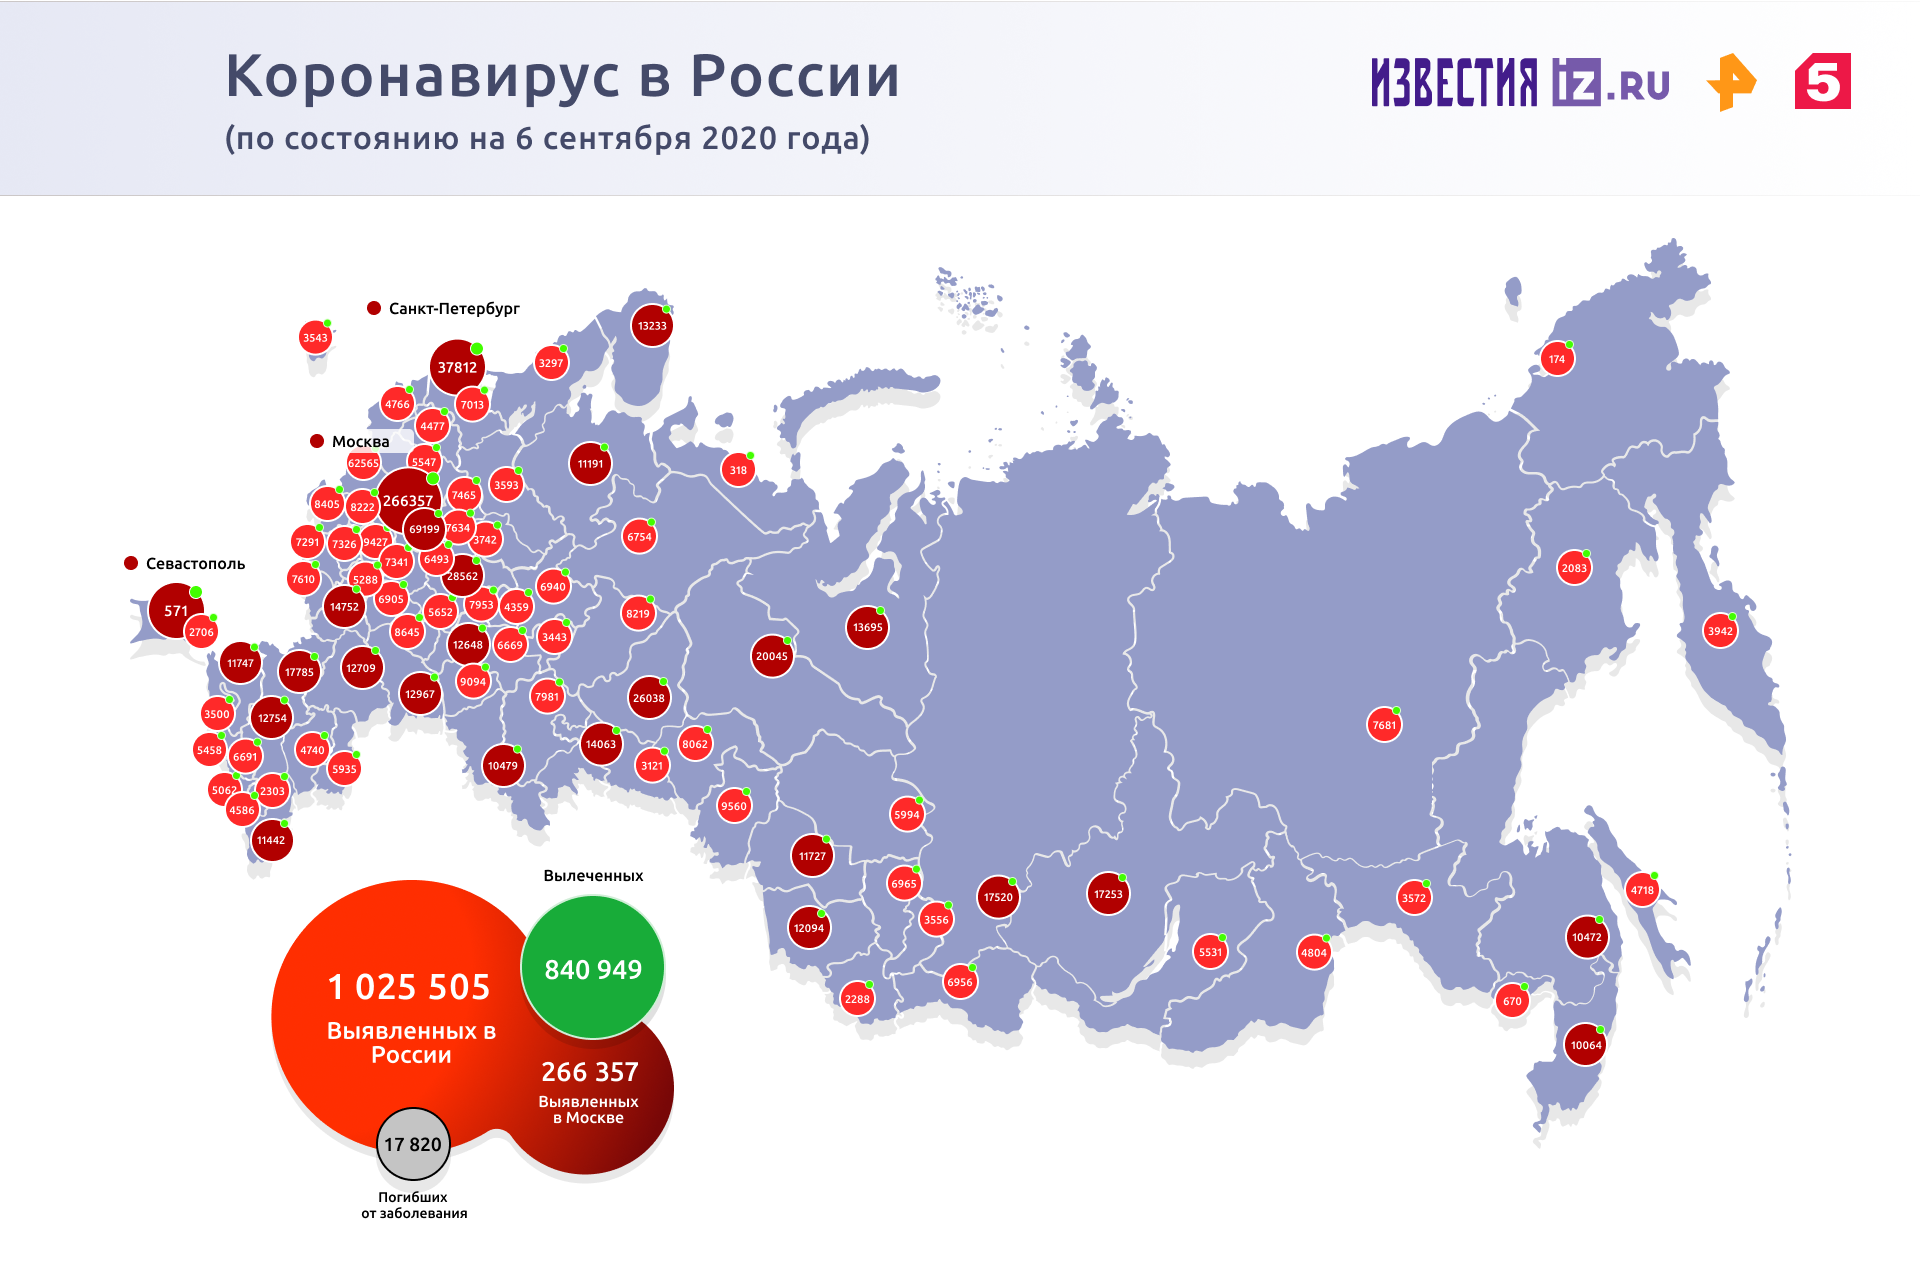 COVID-19: Russian vaccine trial successful in human